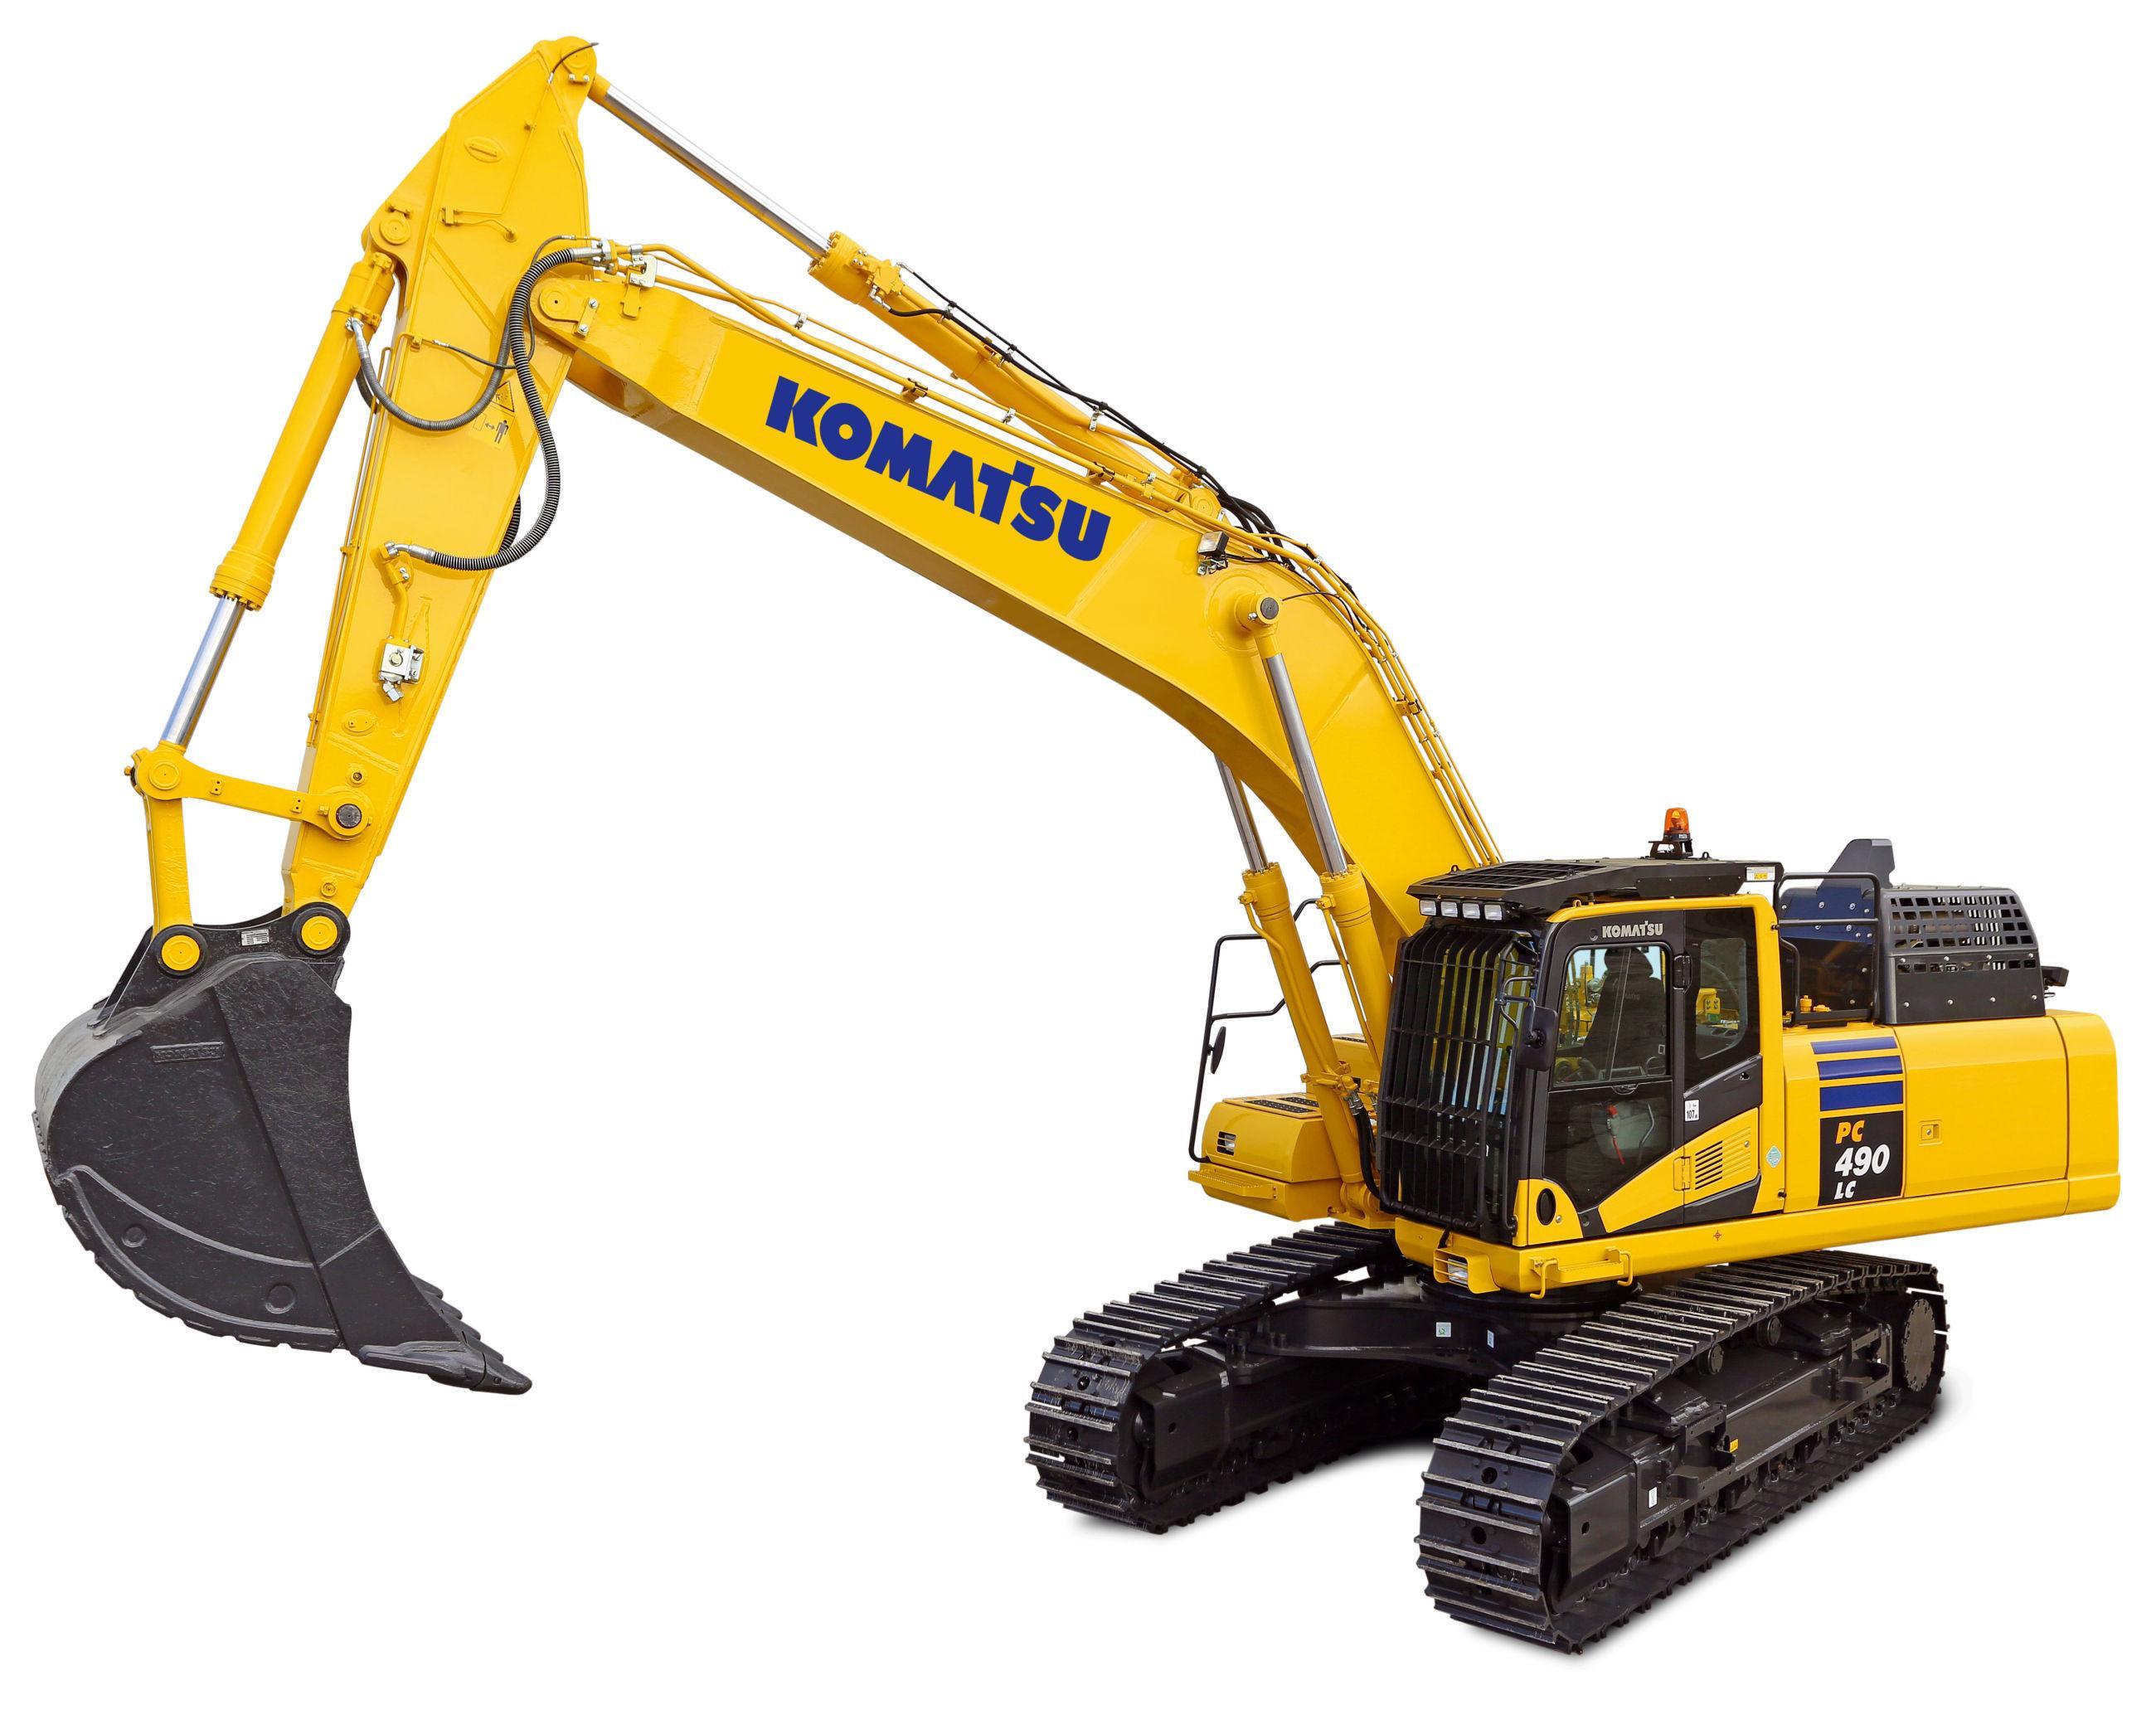 Komatsu Hydraulic Excavator Pc490 Workshop Repair